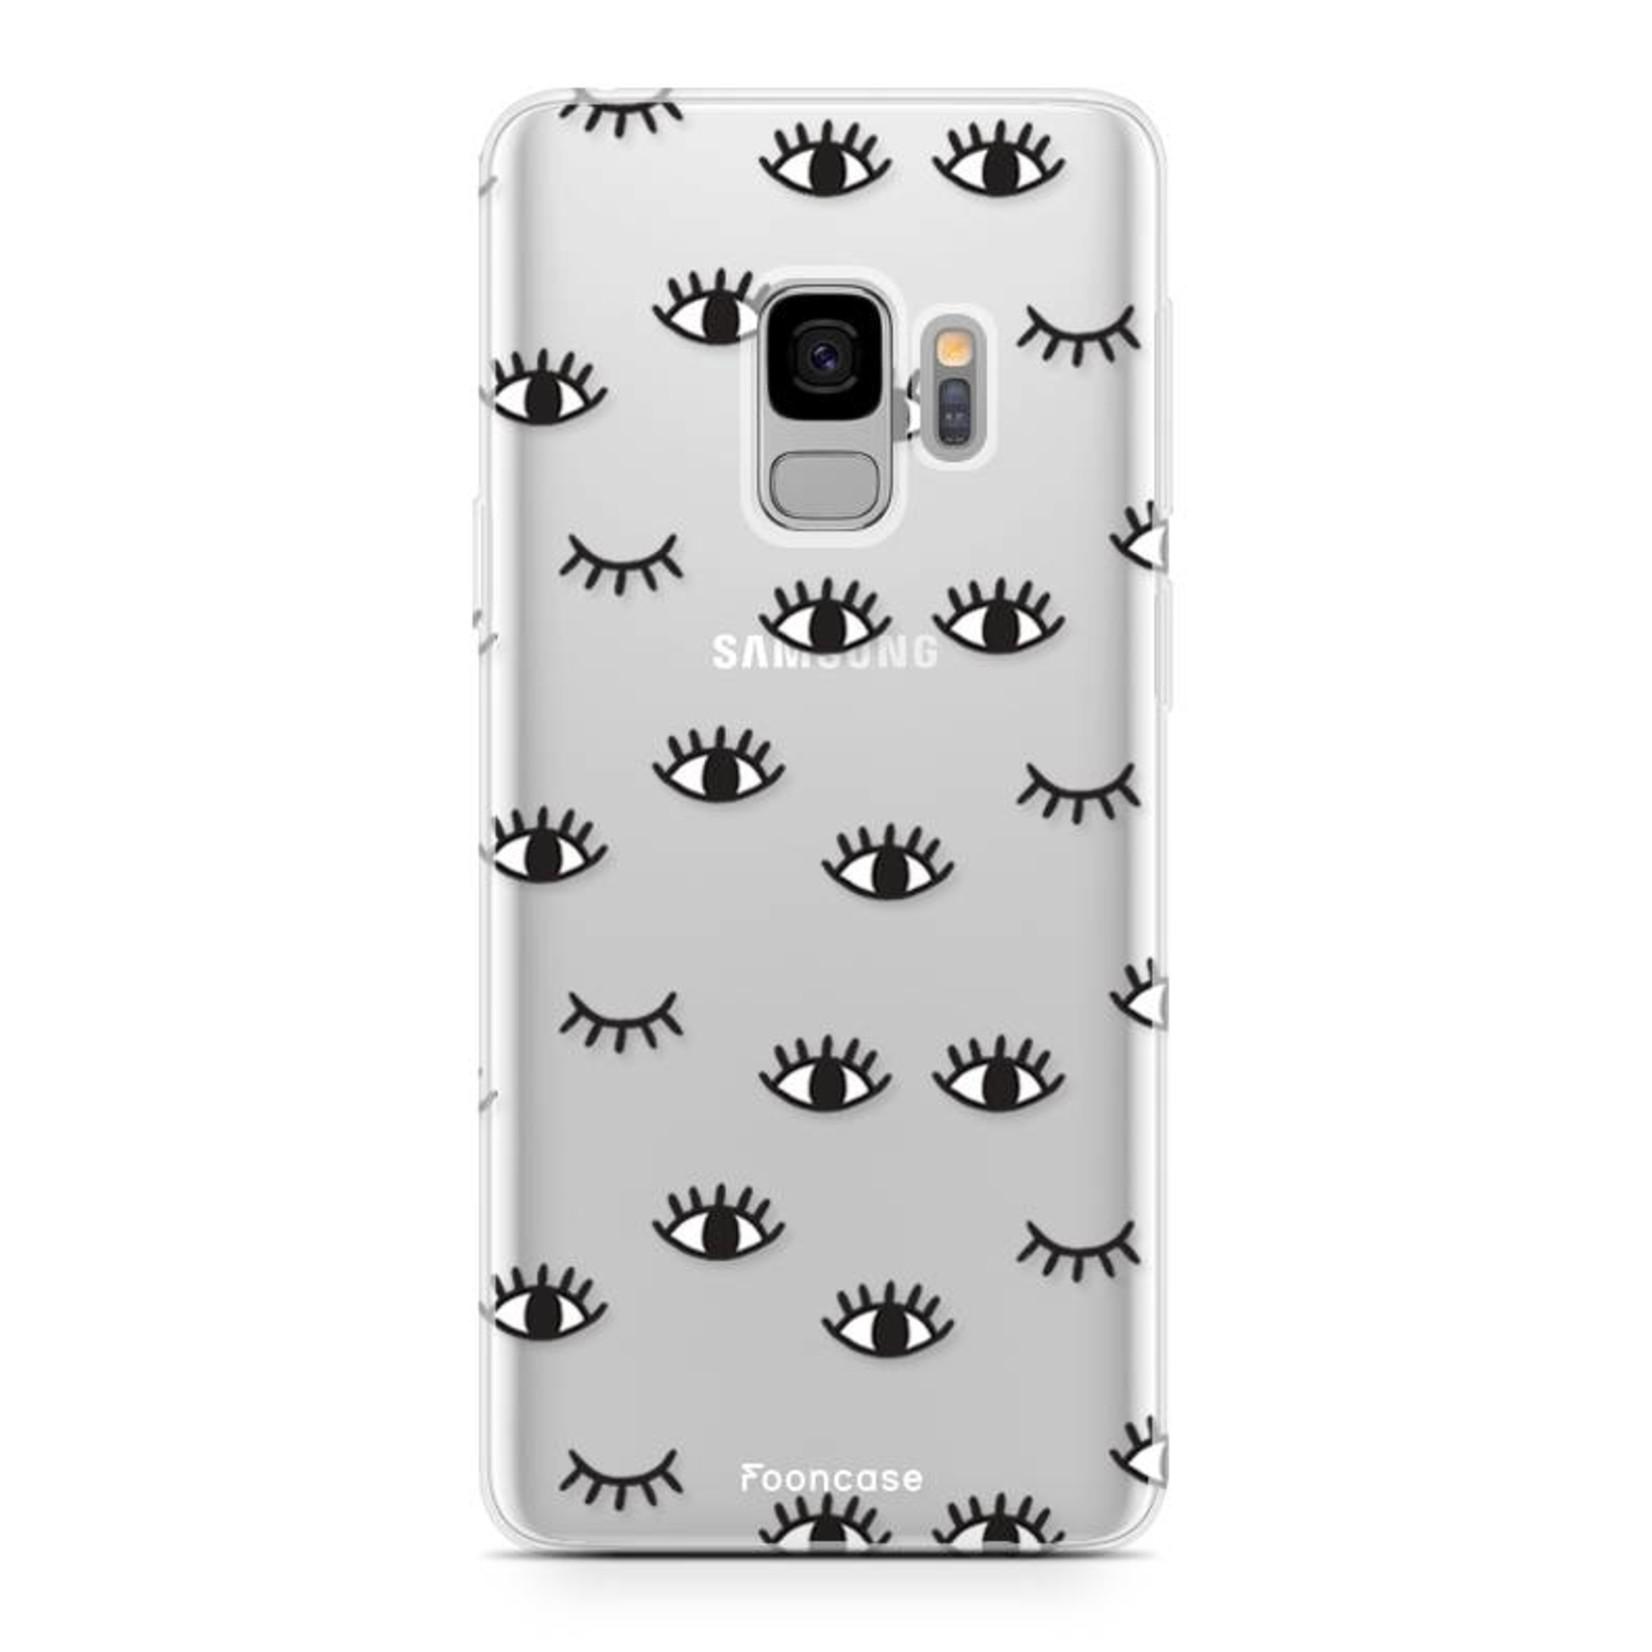 FOONCASE Samsung Galaxy S9 hoesje TPU Soft Case - Back Cover - Eyes / Ogen